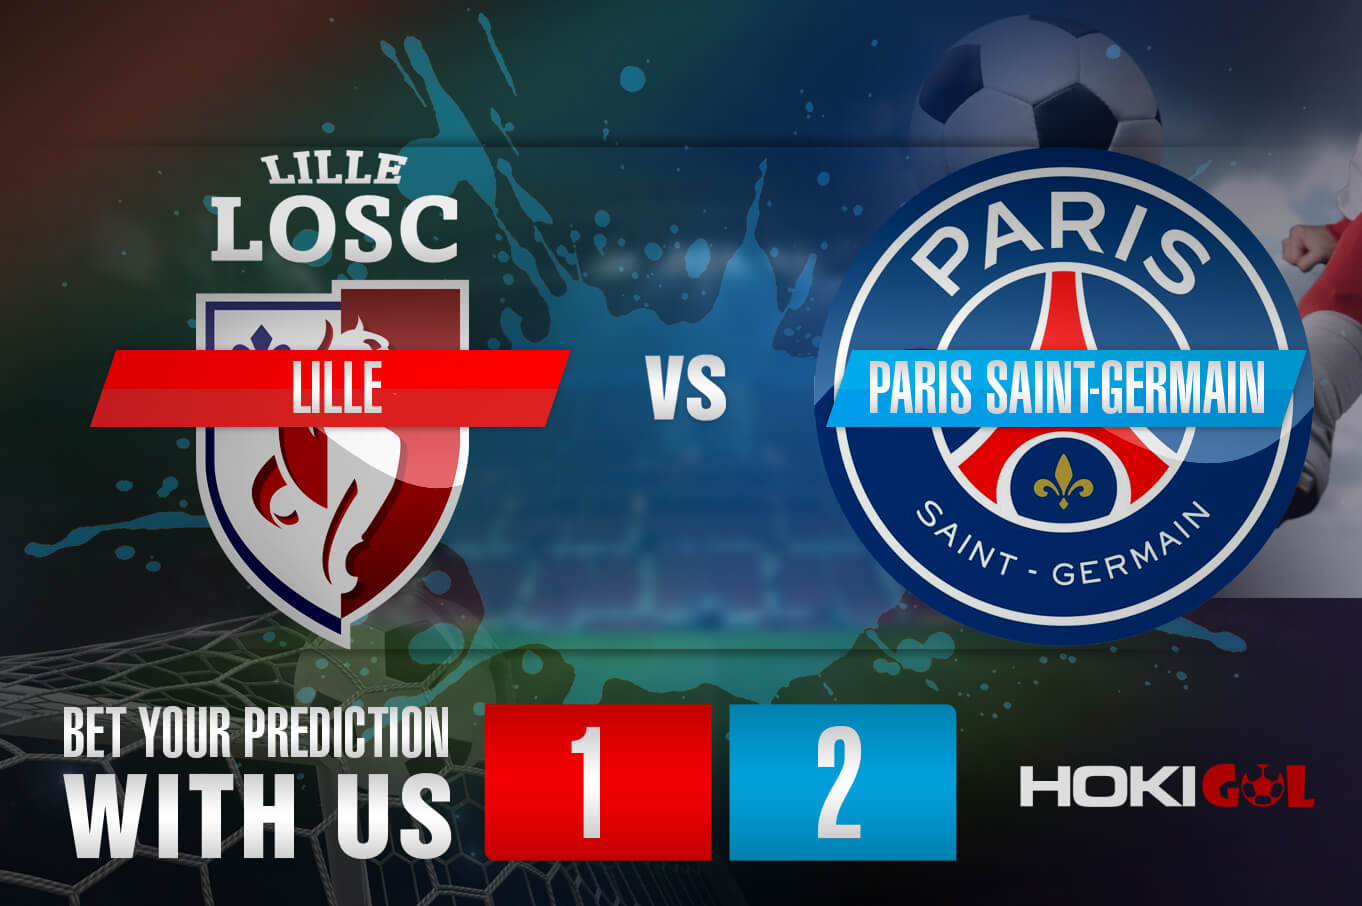 Prediksi Bola Lille Vs Paris Saint-Germain 2 Agustus 2021